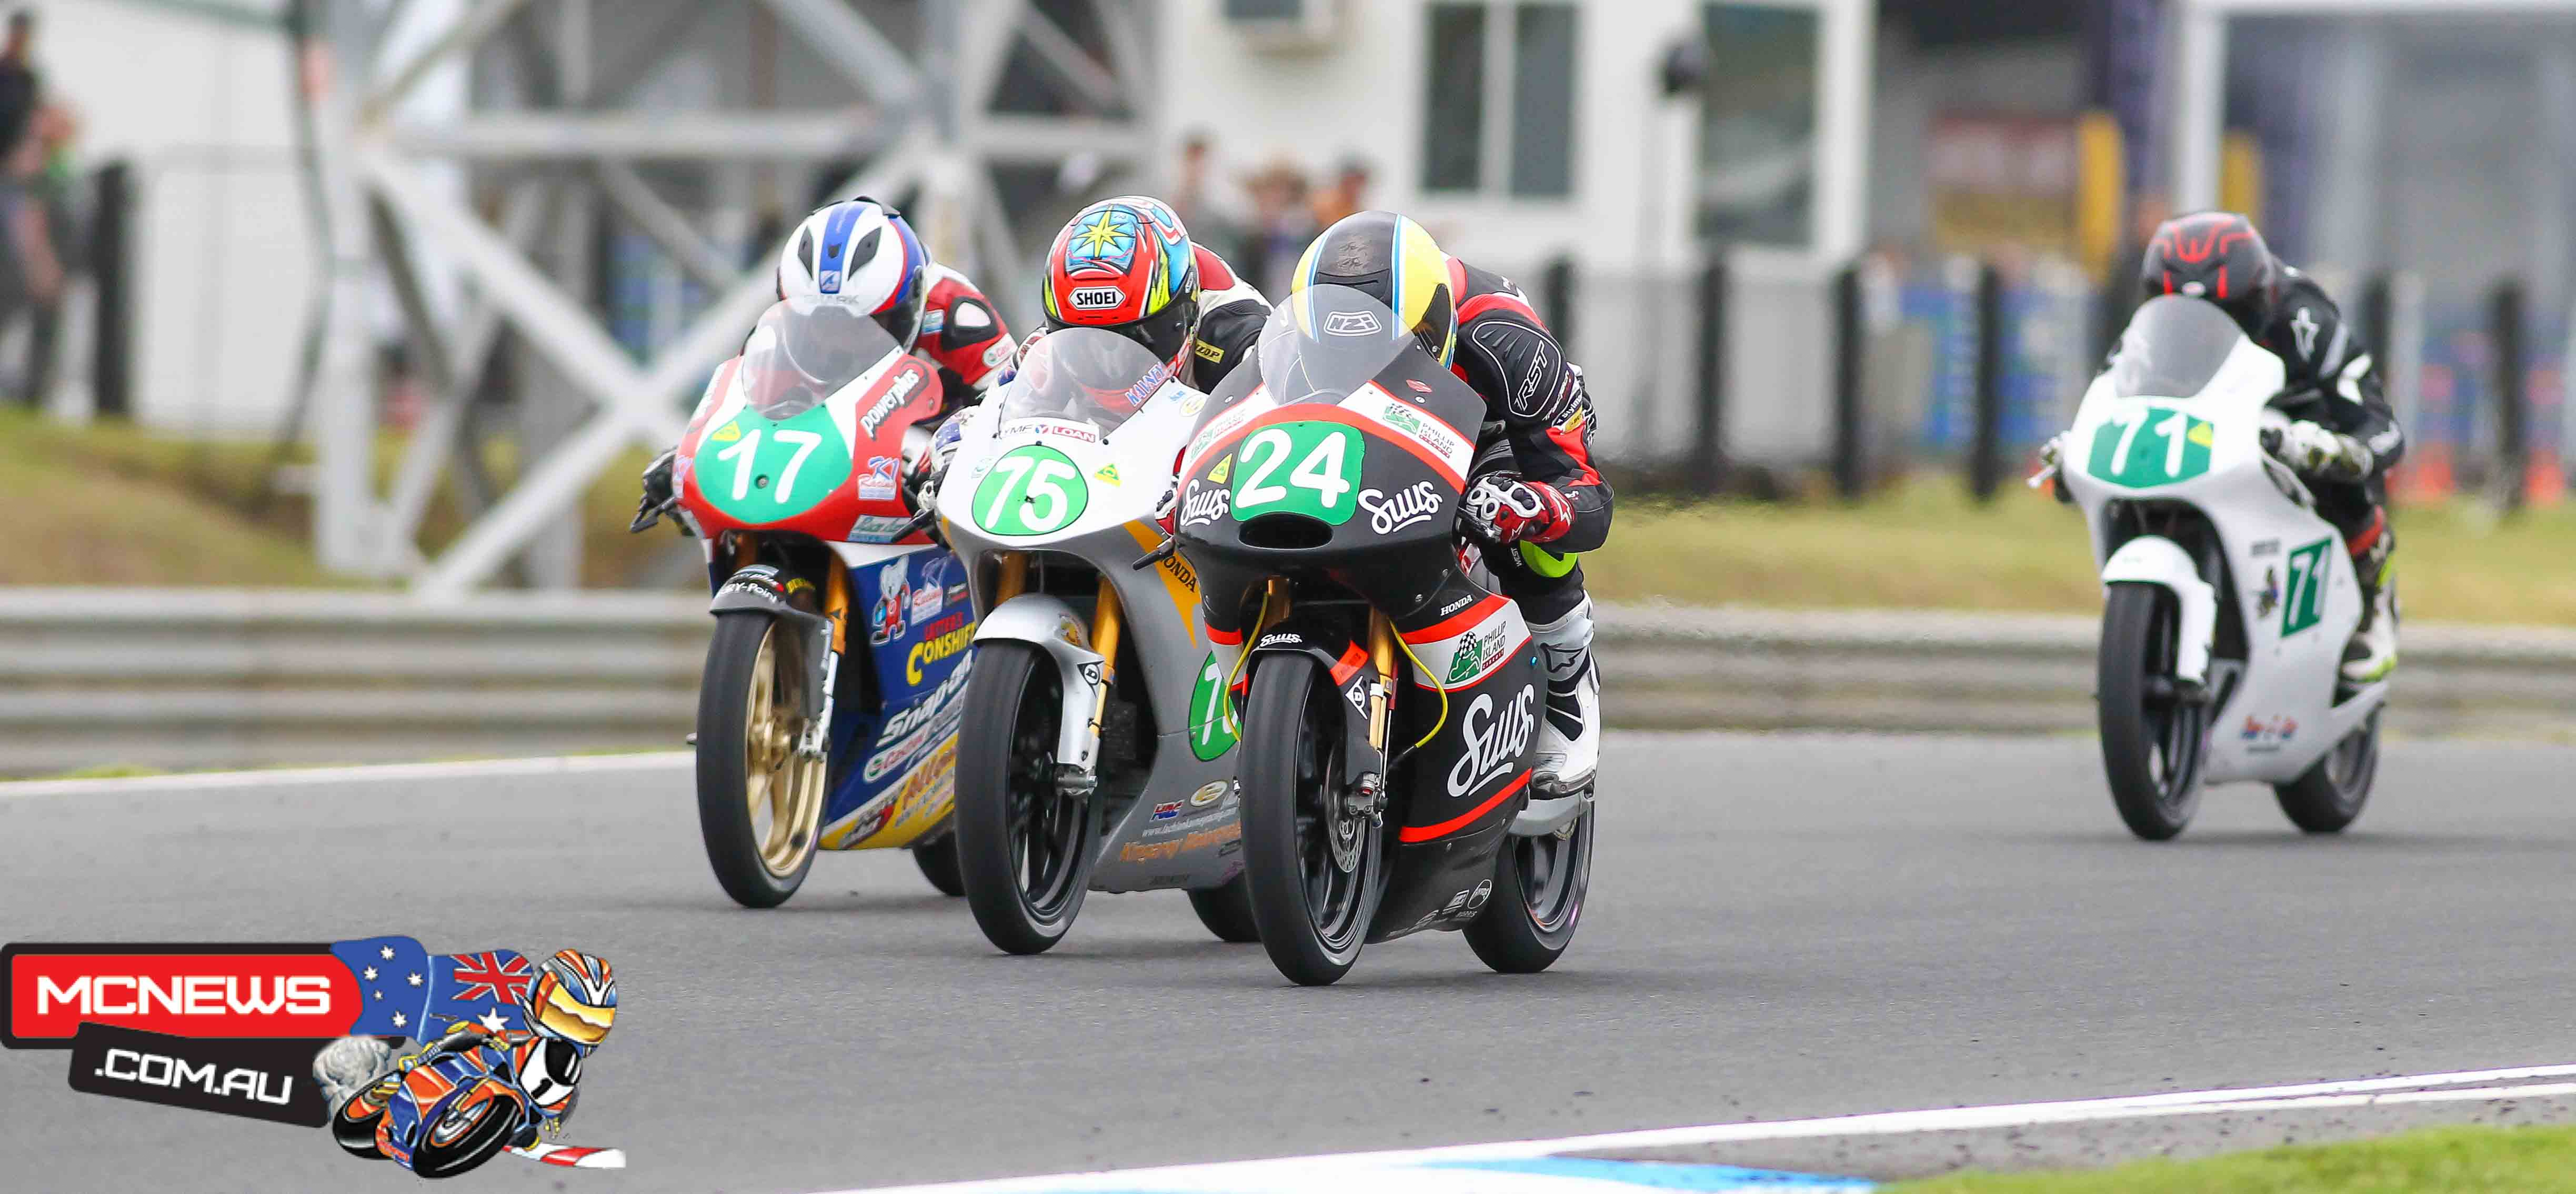 Moto3 - ASBK 2016 - Round One - Phillip Island - Image by Cameron White